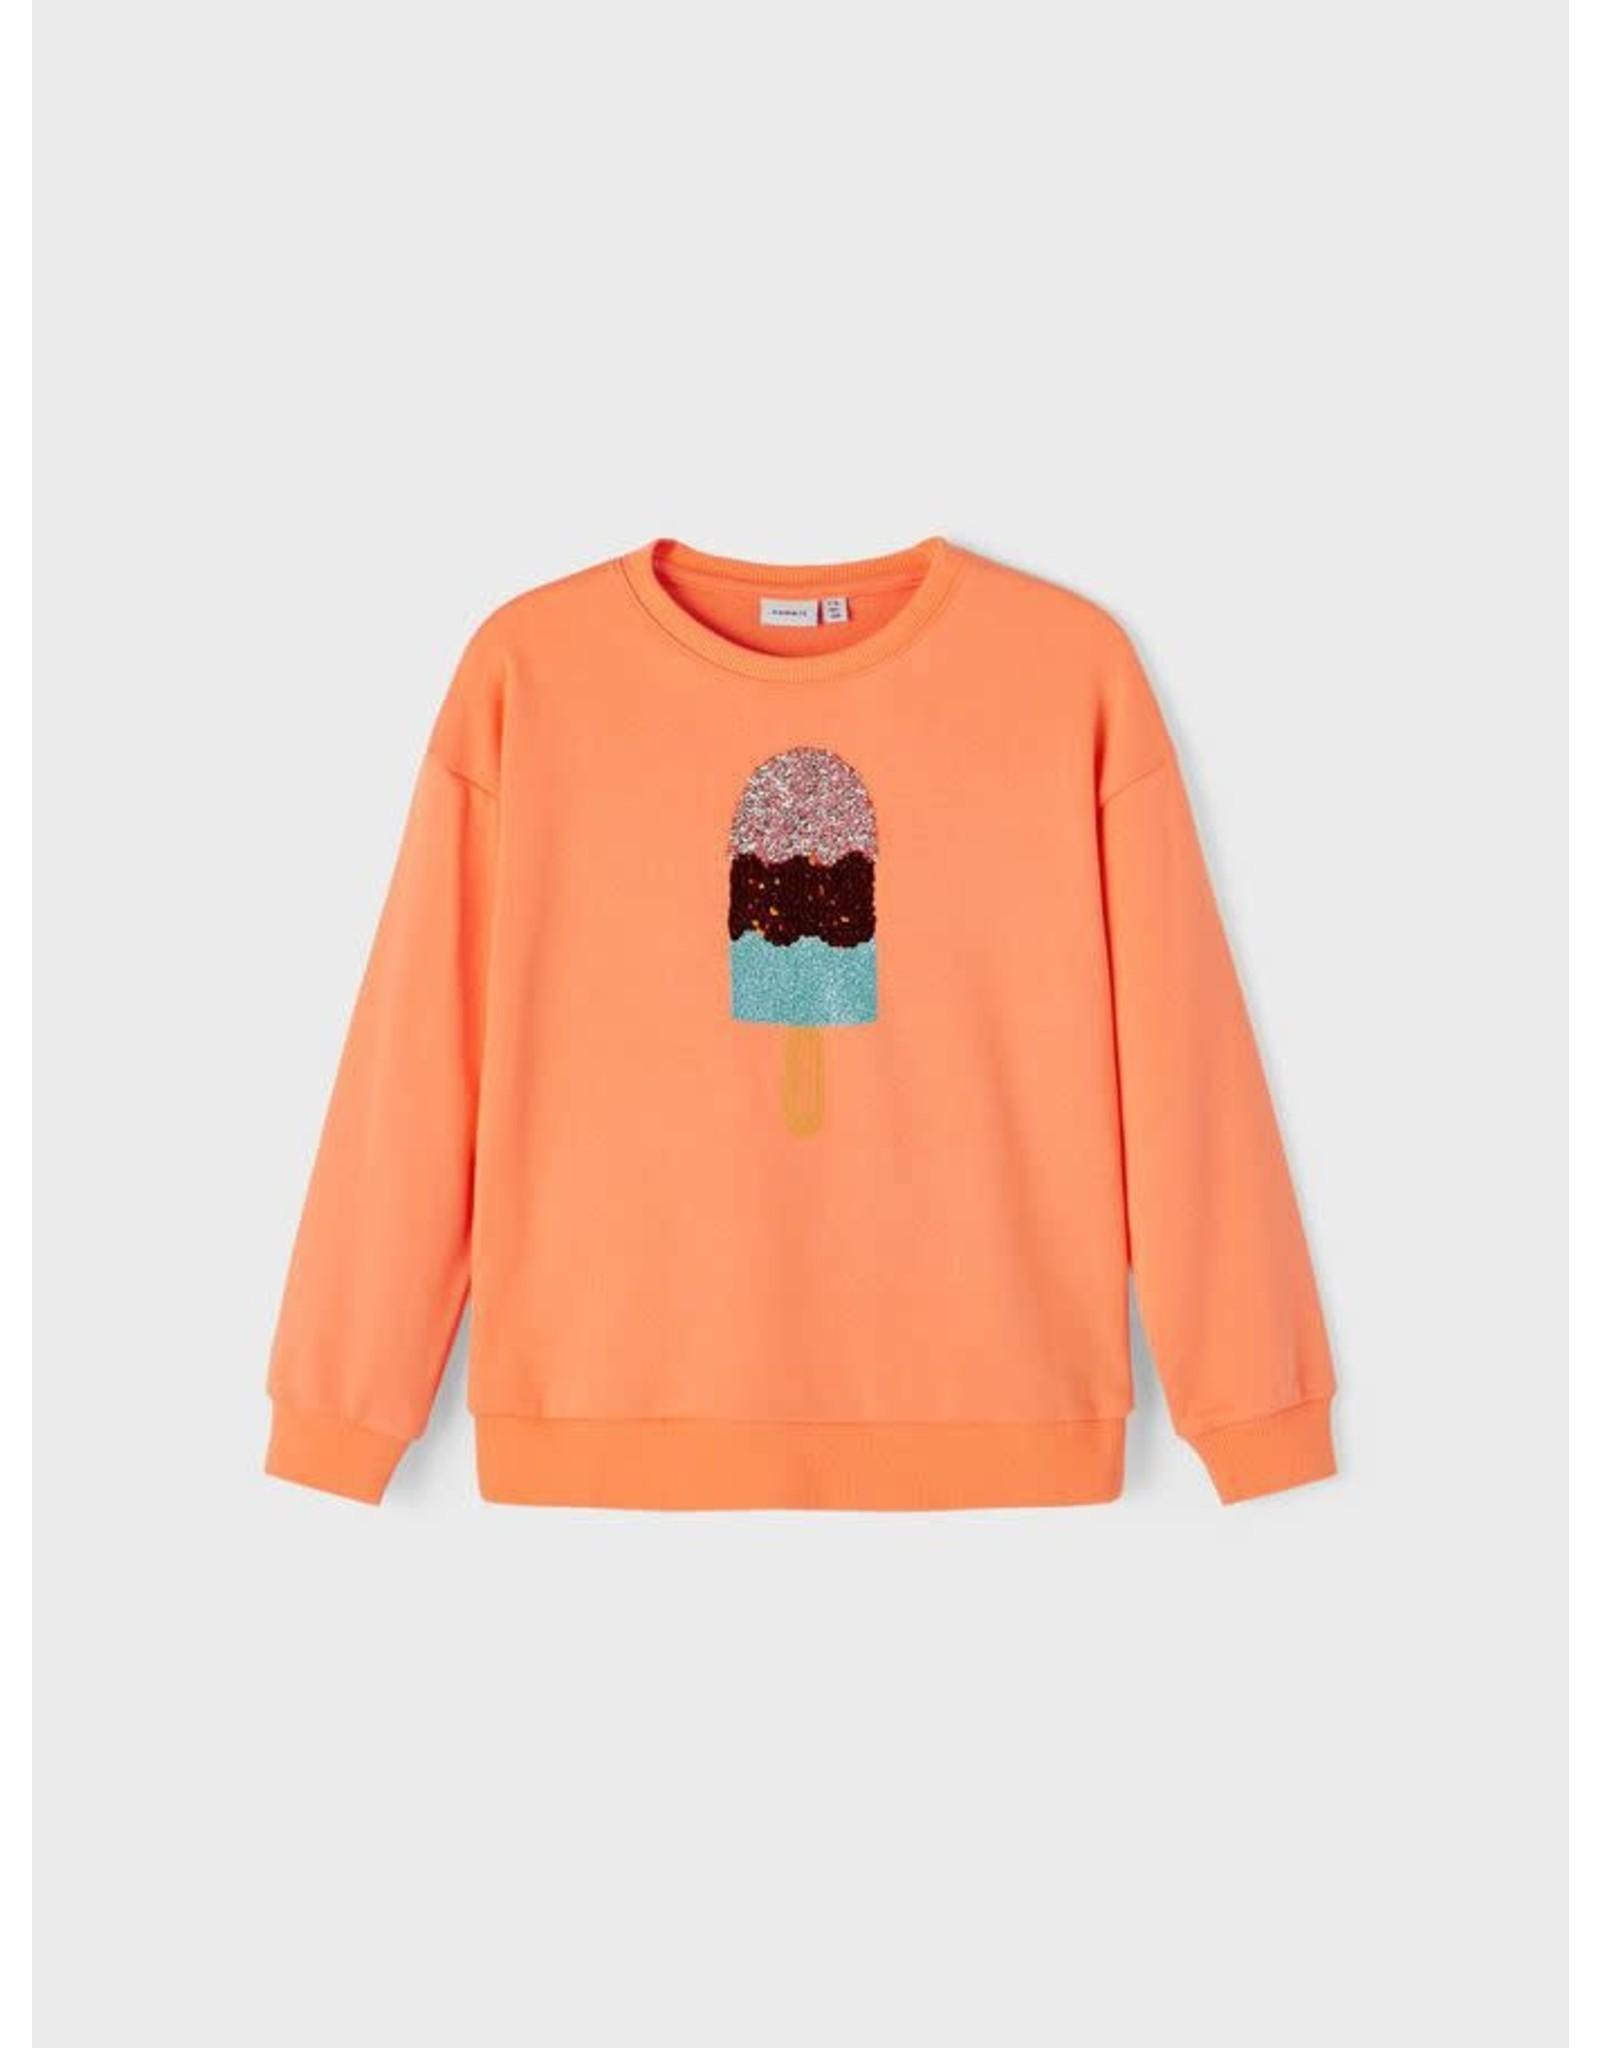 Name It Oranje trui met glitter ijsje